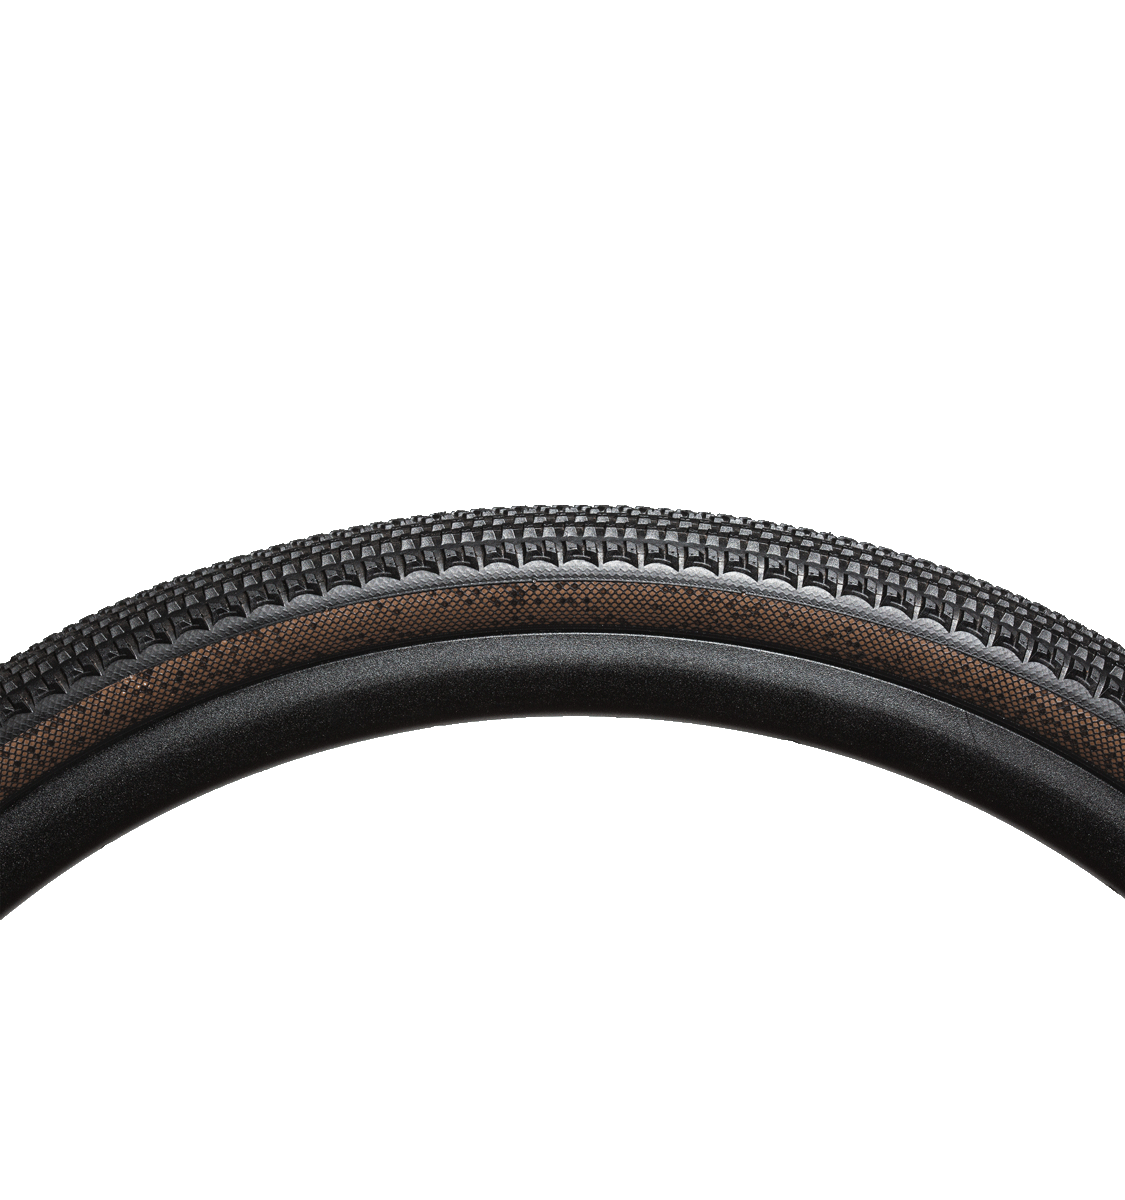 gravel-bike-tires-tubeless-touareg-gridskin-hutchinson-made-in-france-5